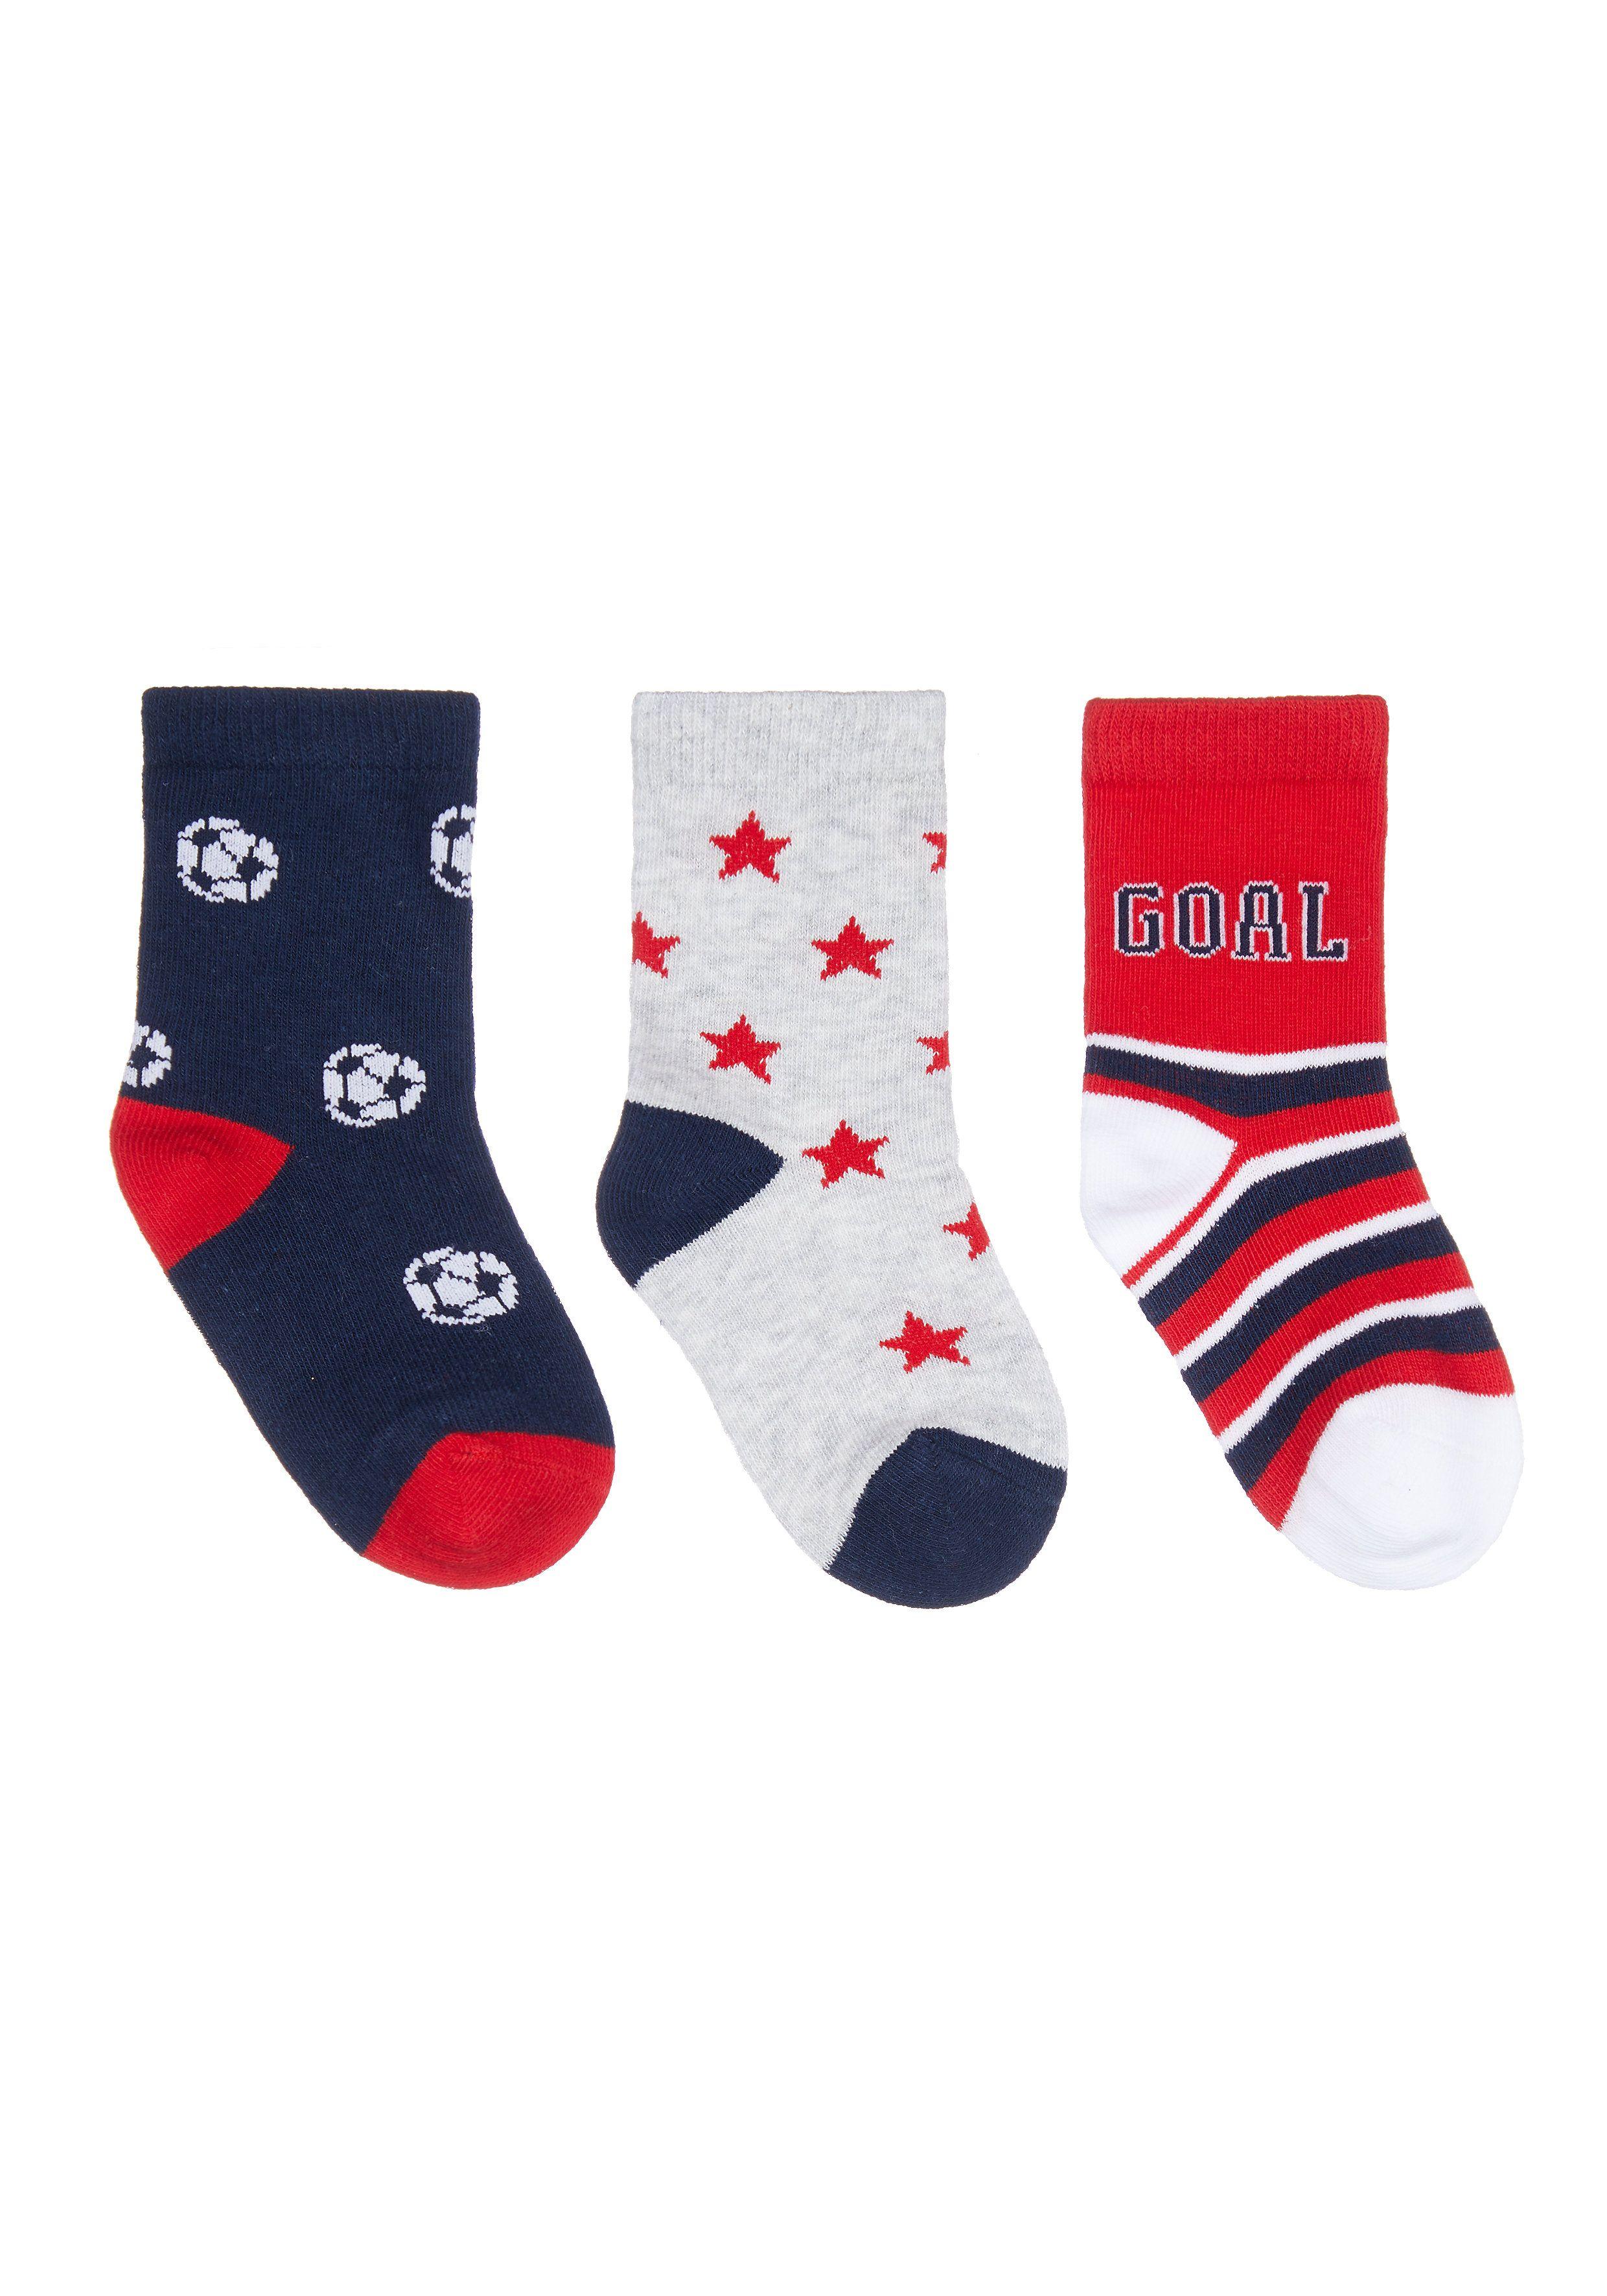 Mothercare | Football Socks - 3 Pack